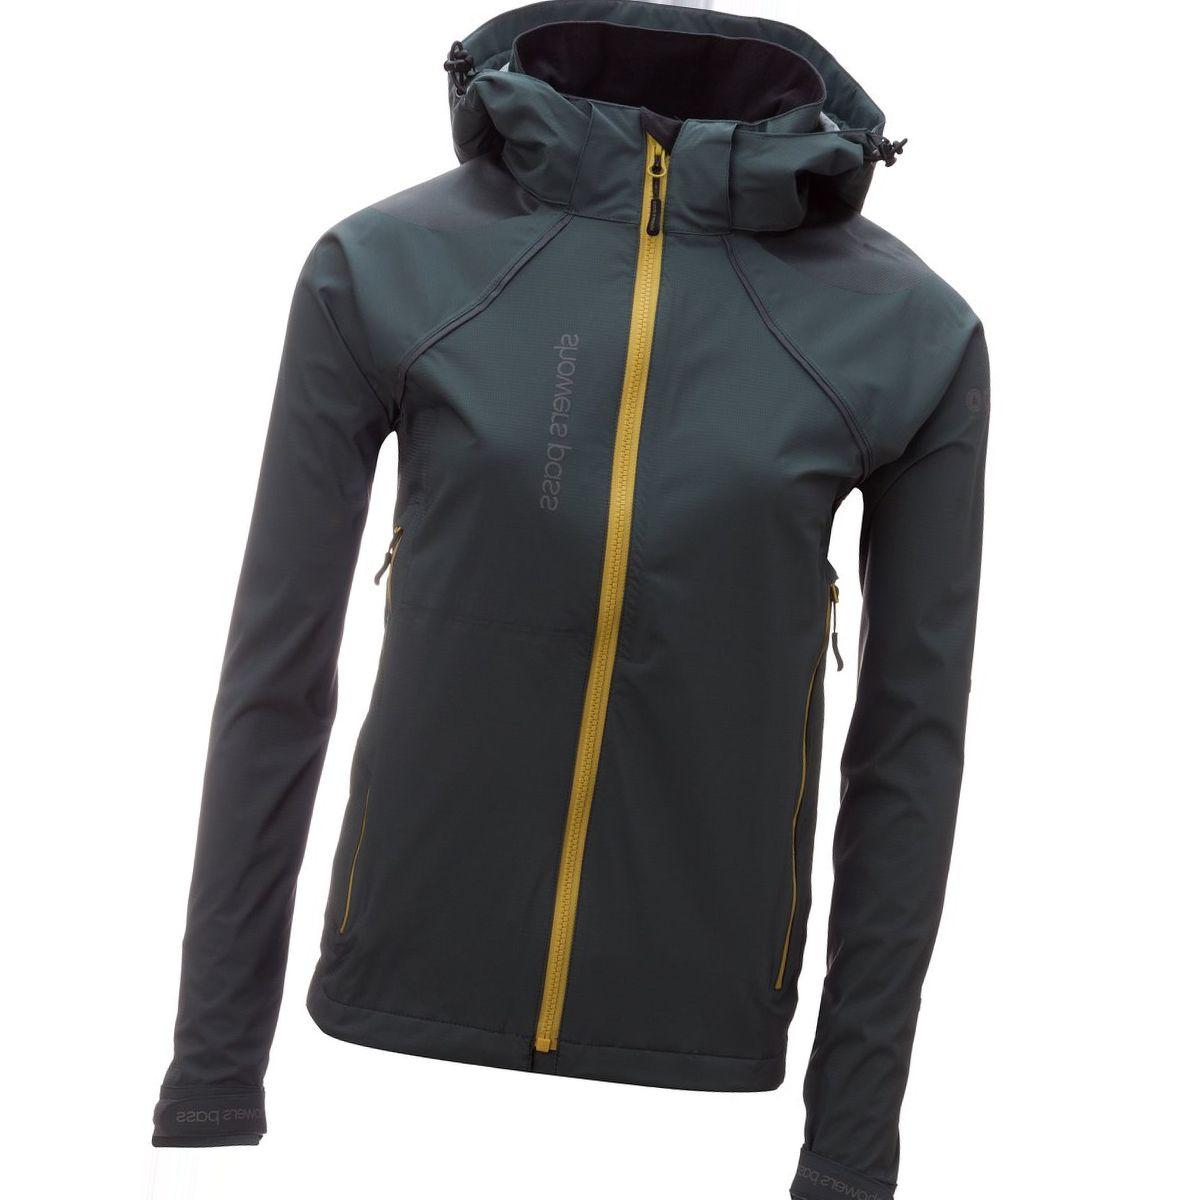 Showers Pass IMBA Jacket - Women's